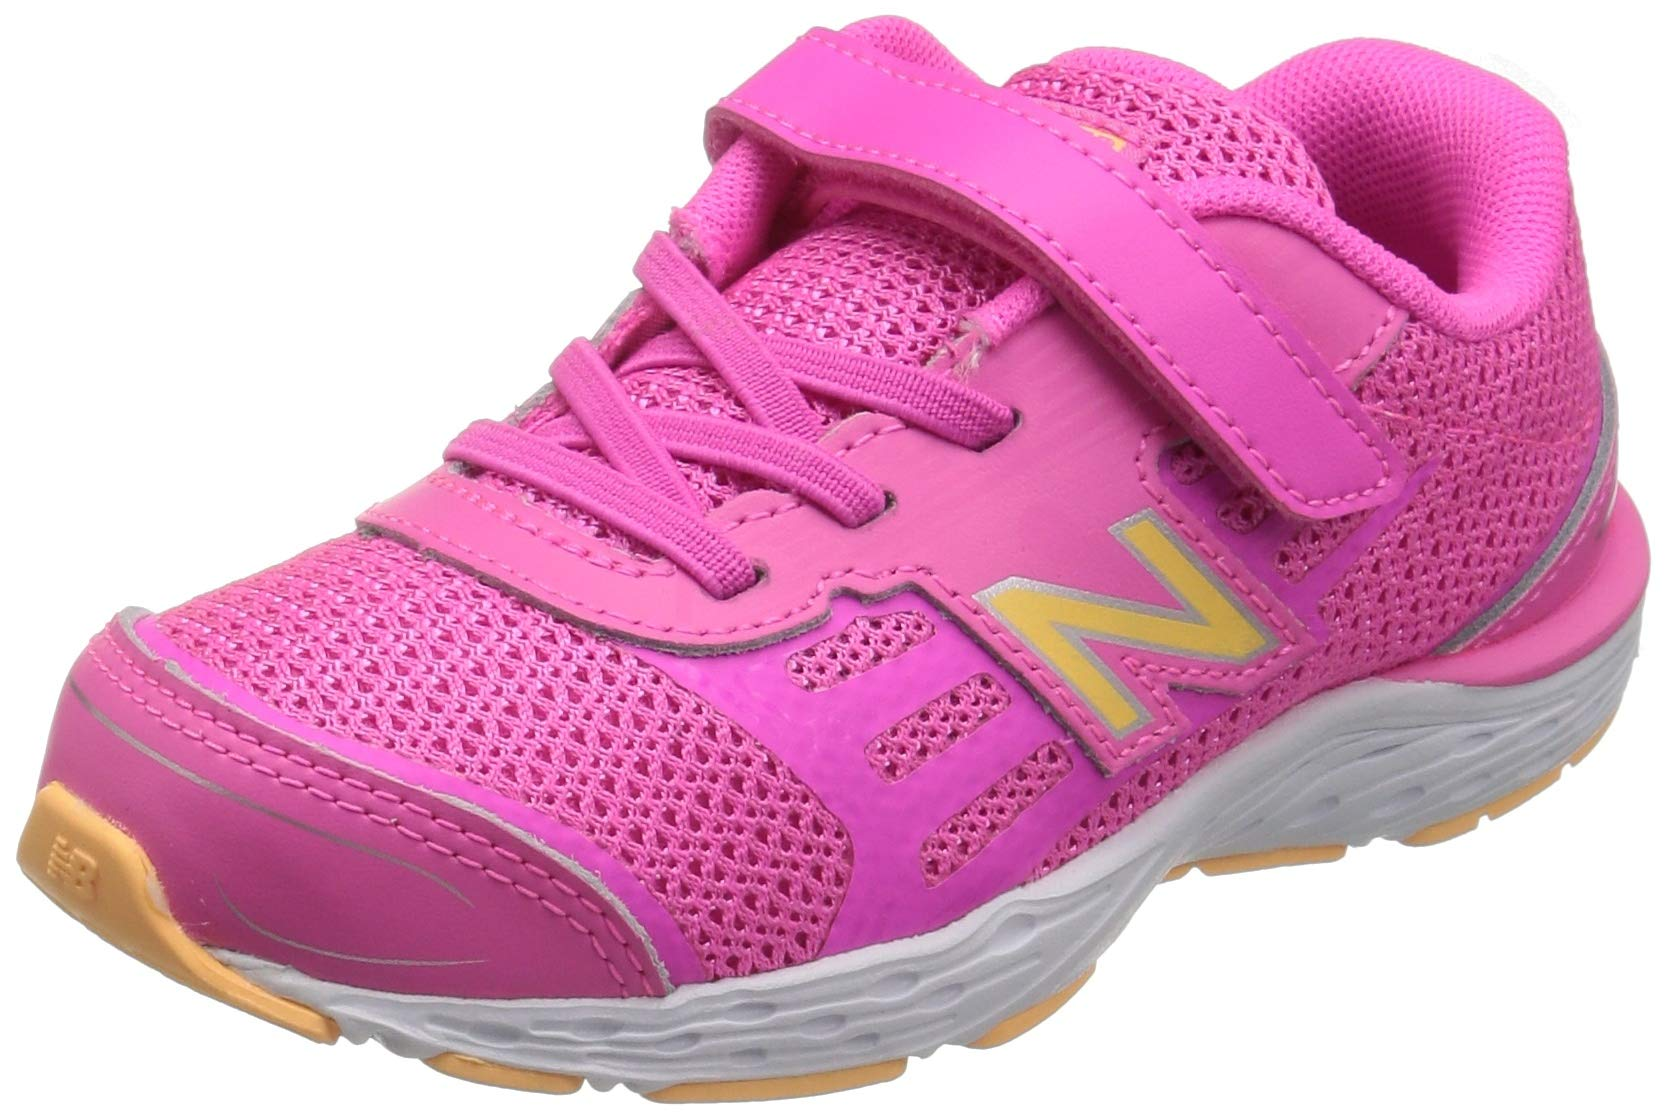 New Balance Girls' 680v5 Hook and Loop Running Shoe, Light Peony/Light Mango, 2 W US Infant by New Balance (Image #1)